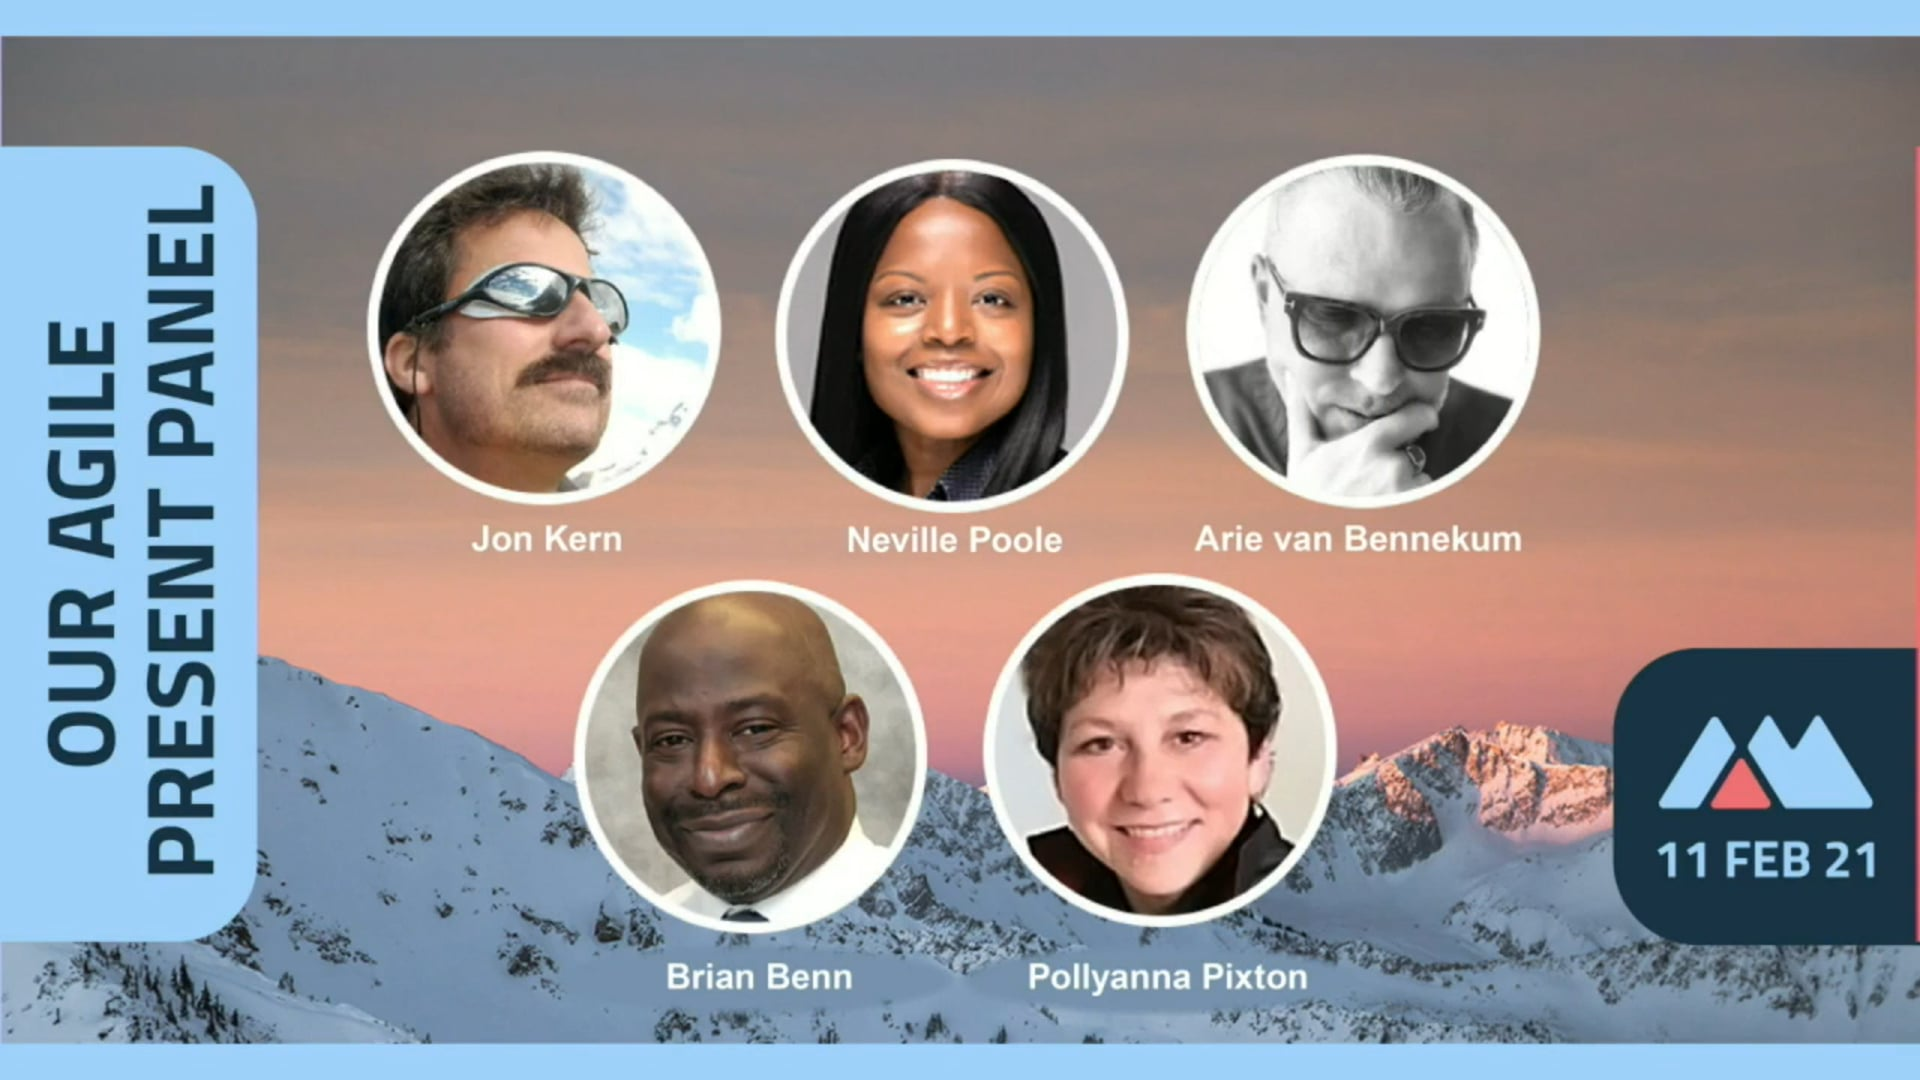 Agile Manifesto 20th Anniversary - Present Panel